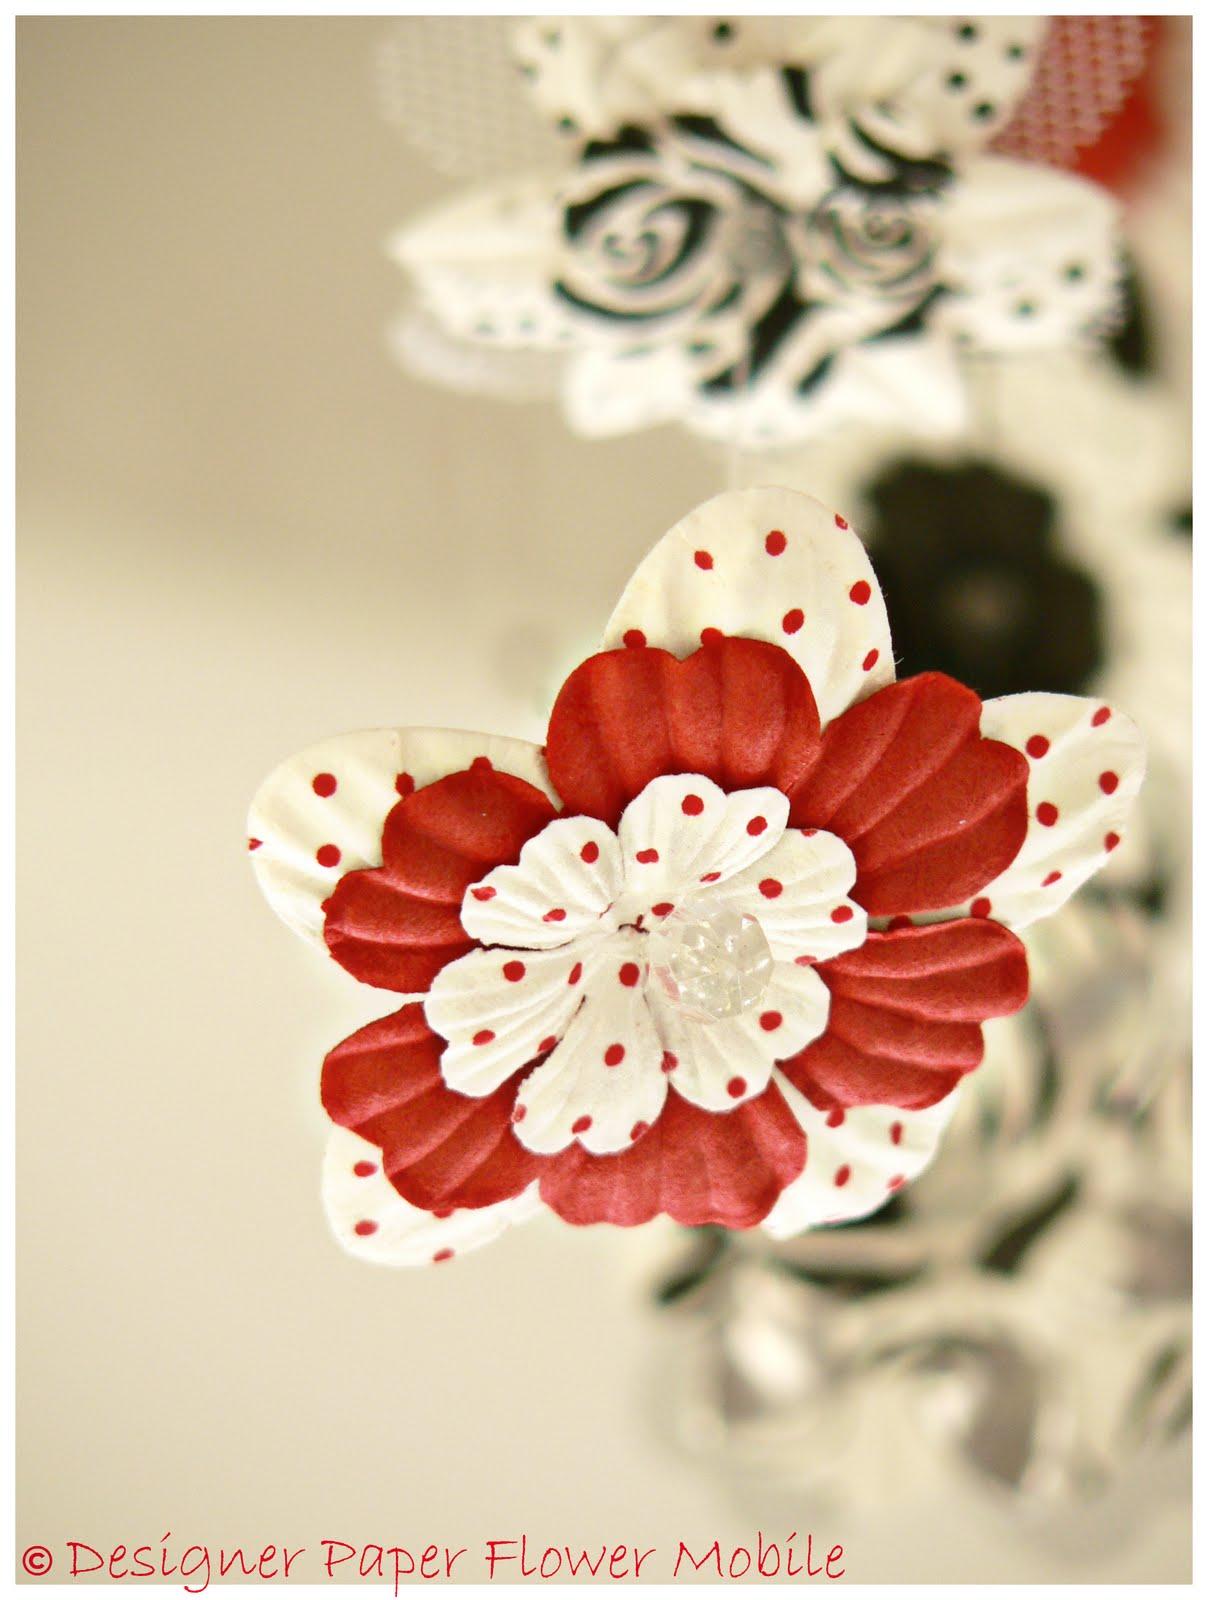 Paper Flower Mobile Akbaeenw